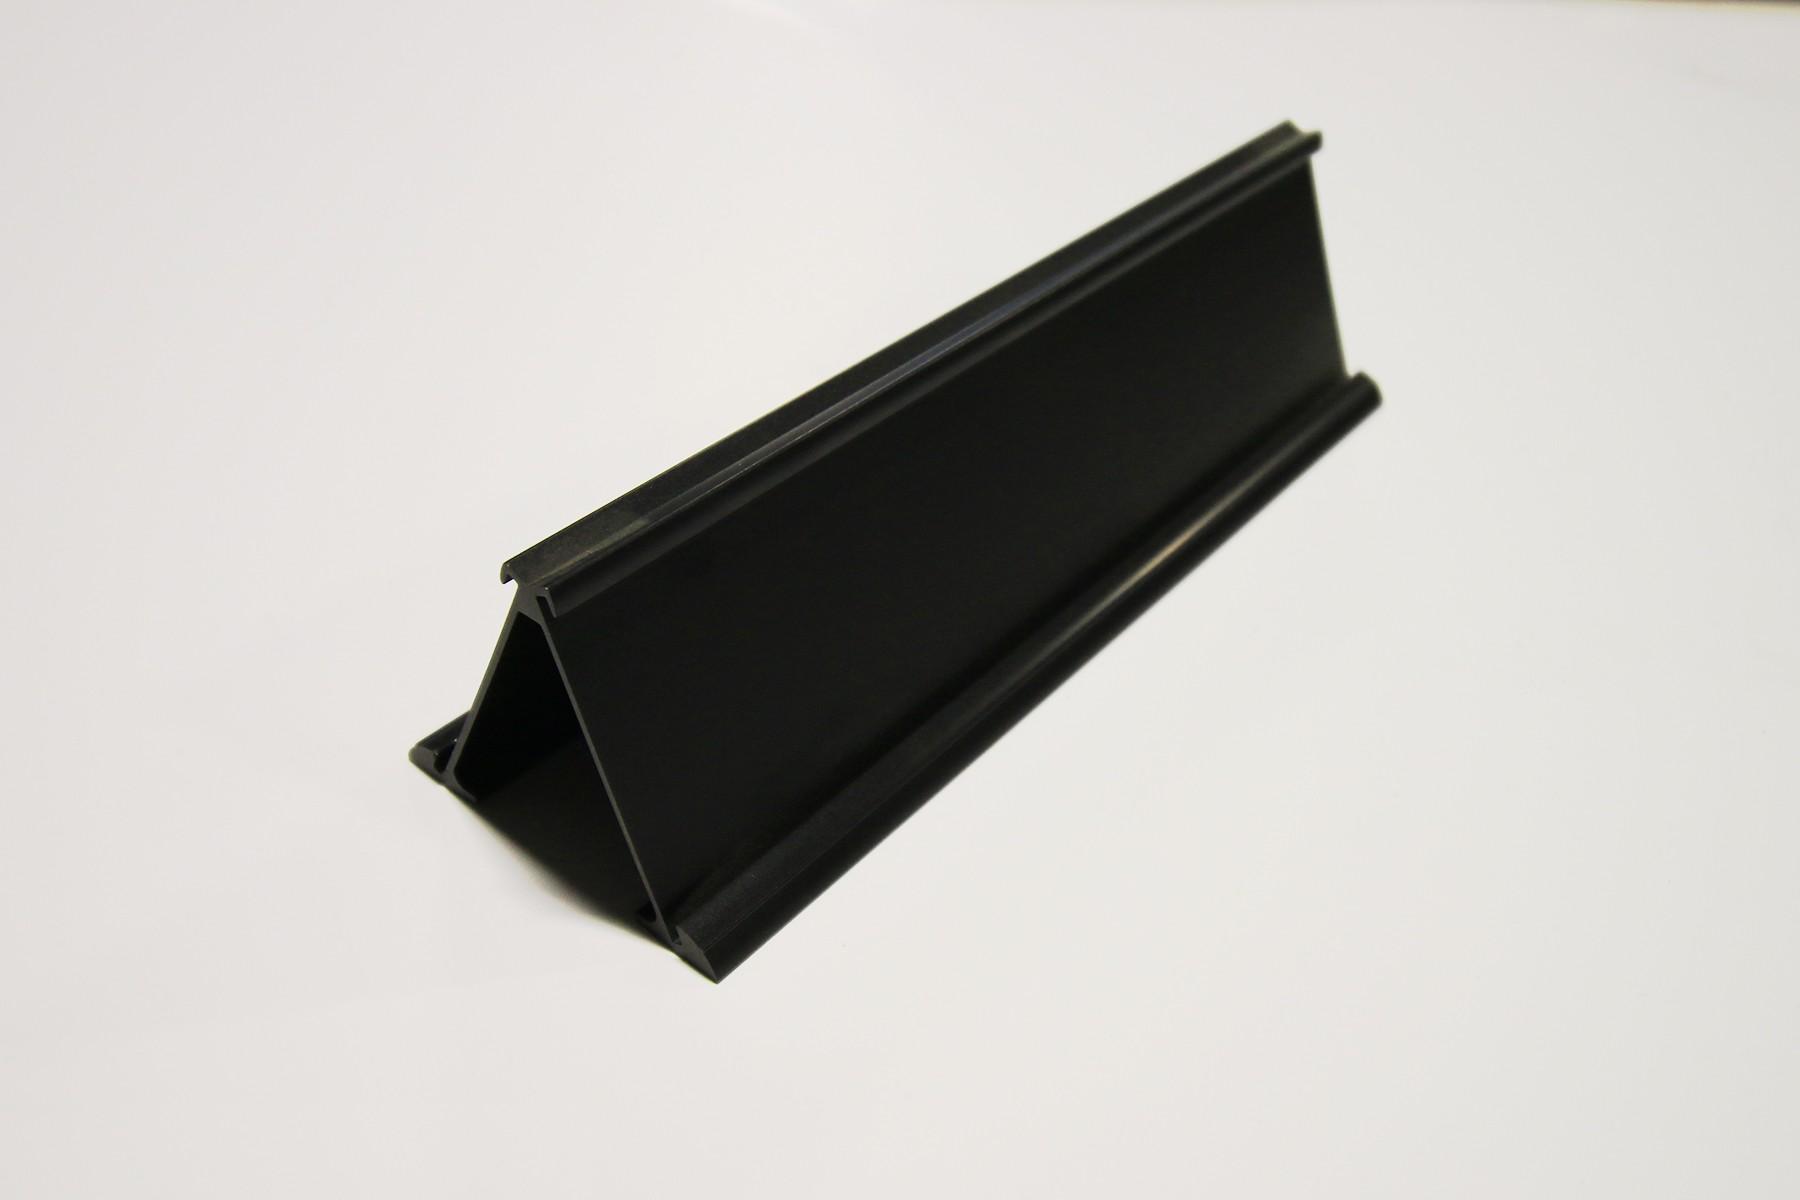 2 x 10 2-Sided Desk Holder, Black